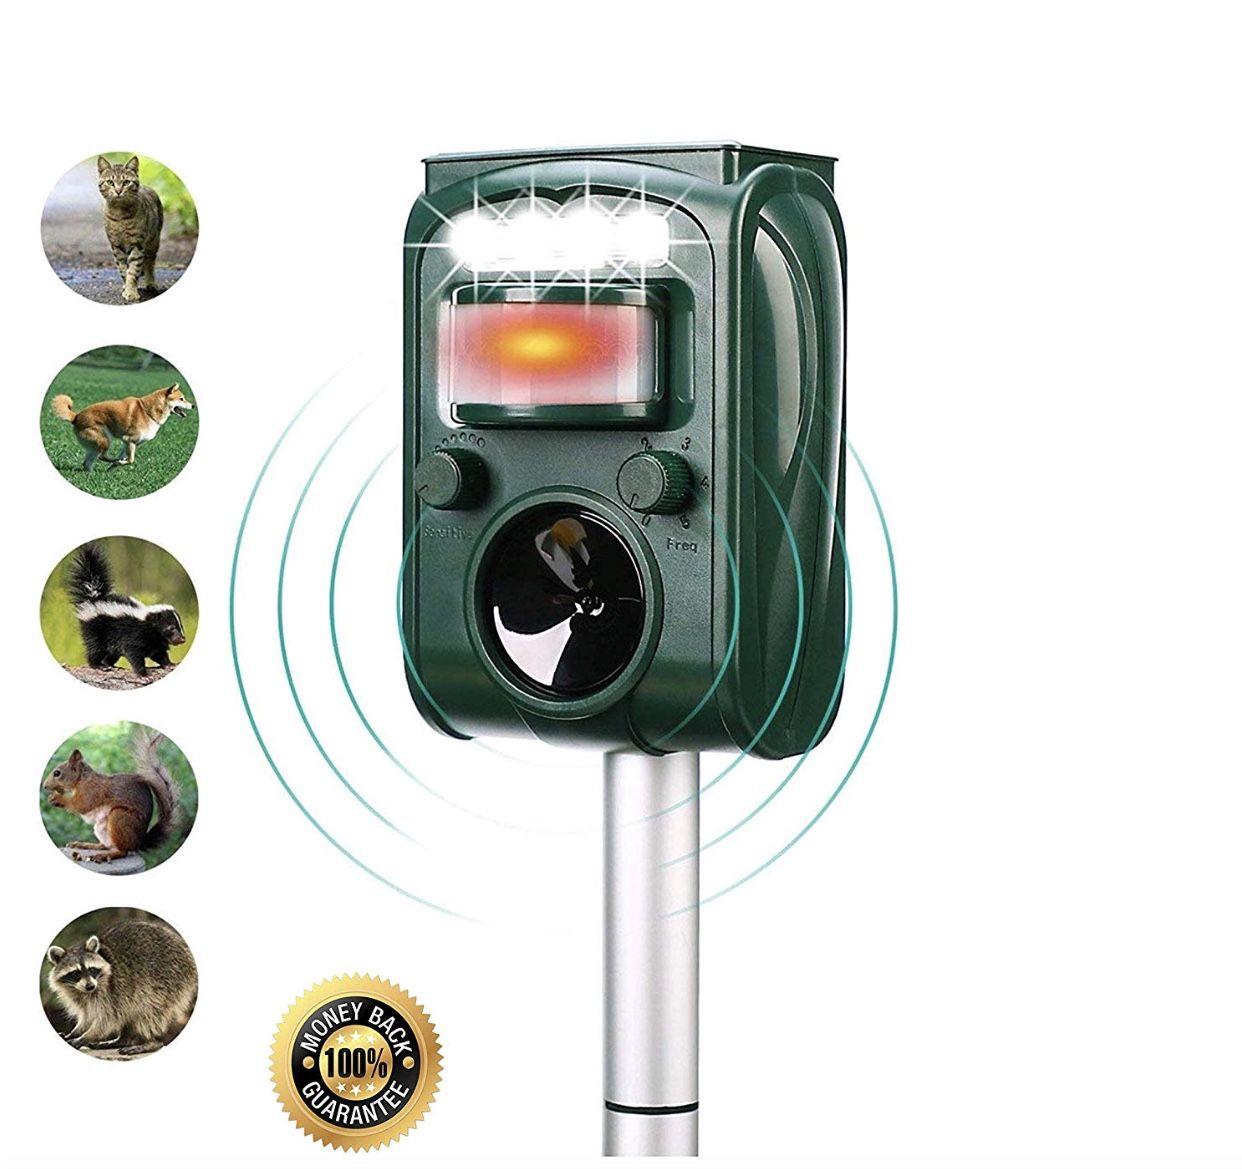 Ultrasonic animal repeller keep dogs, cats, birds